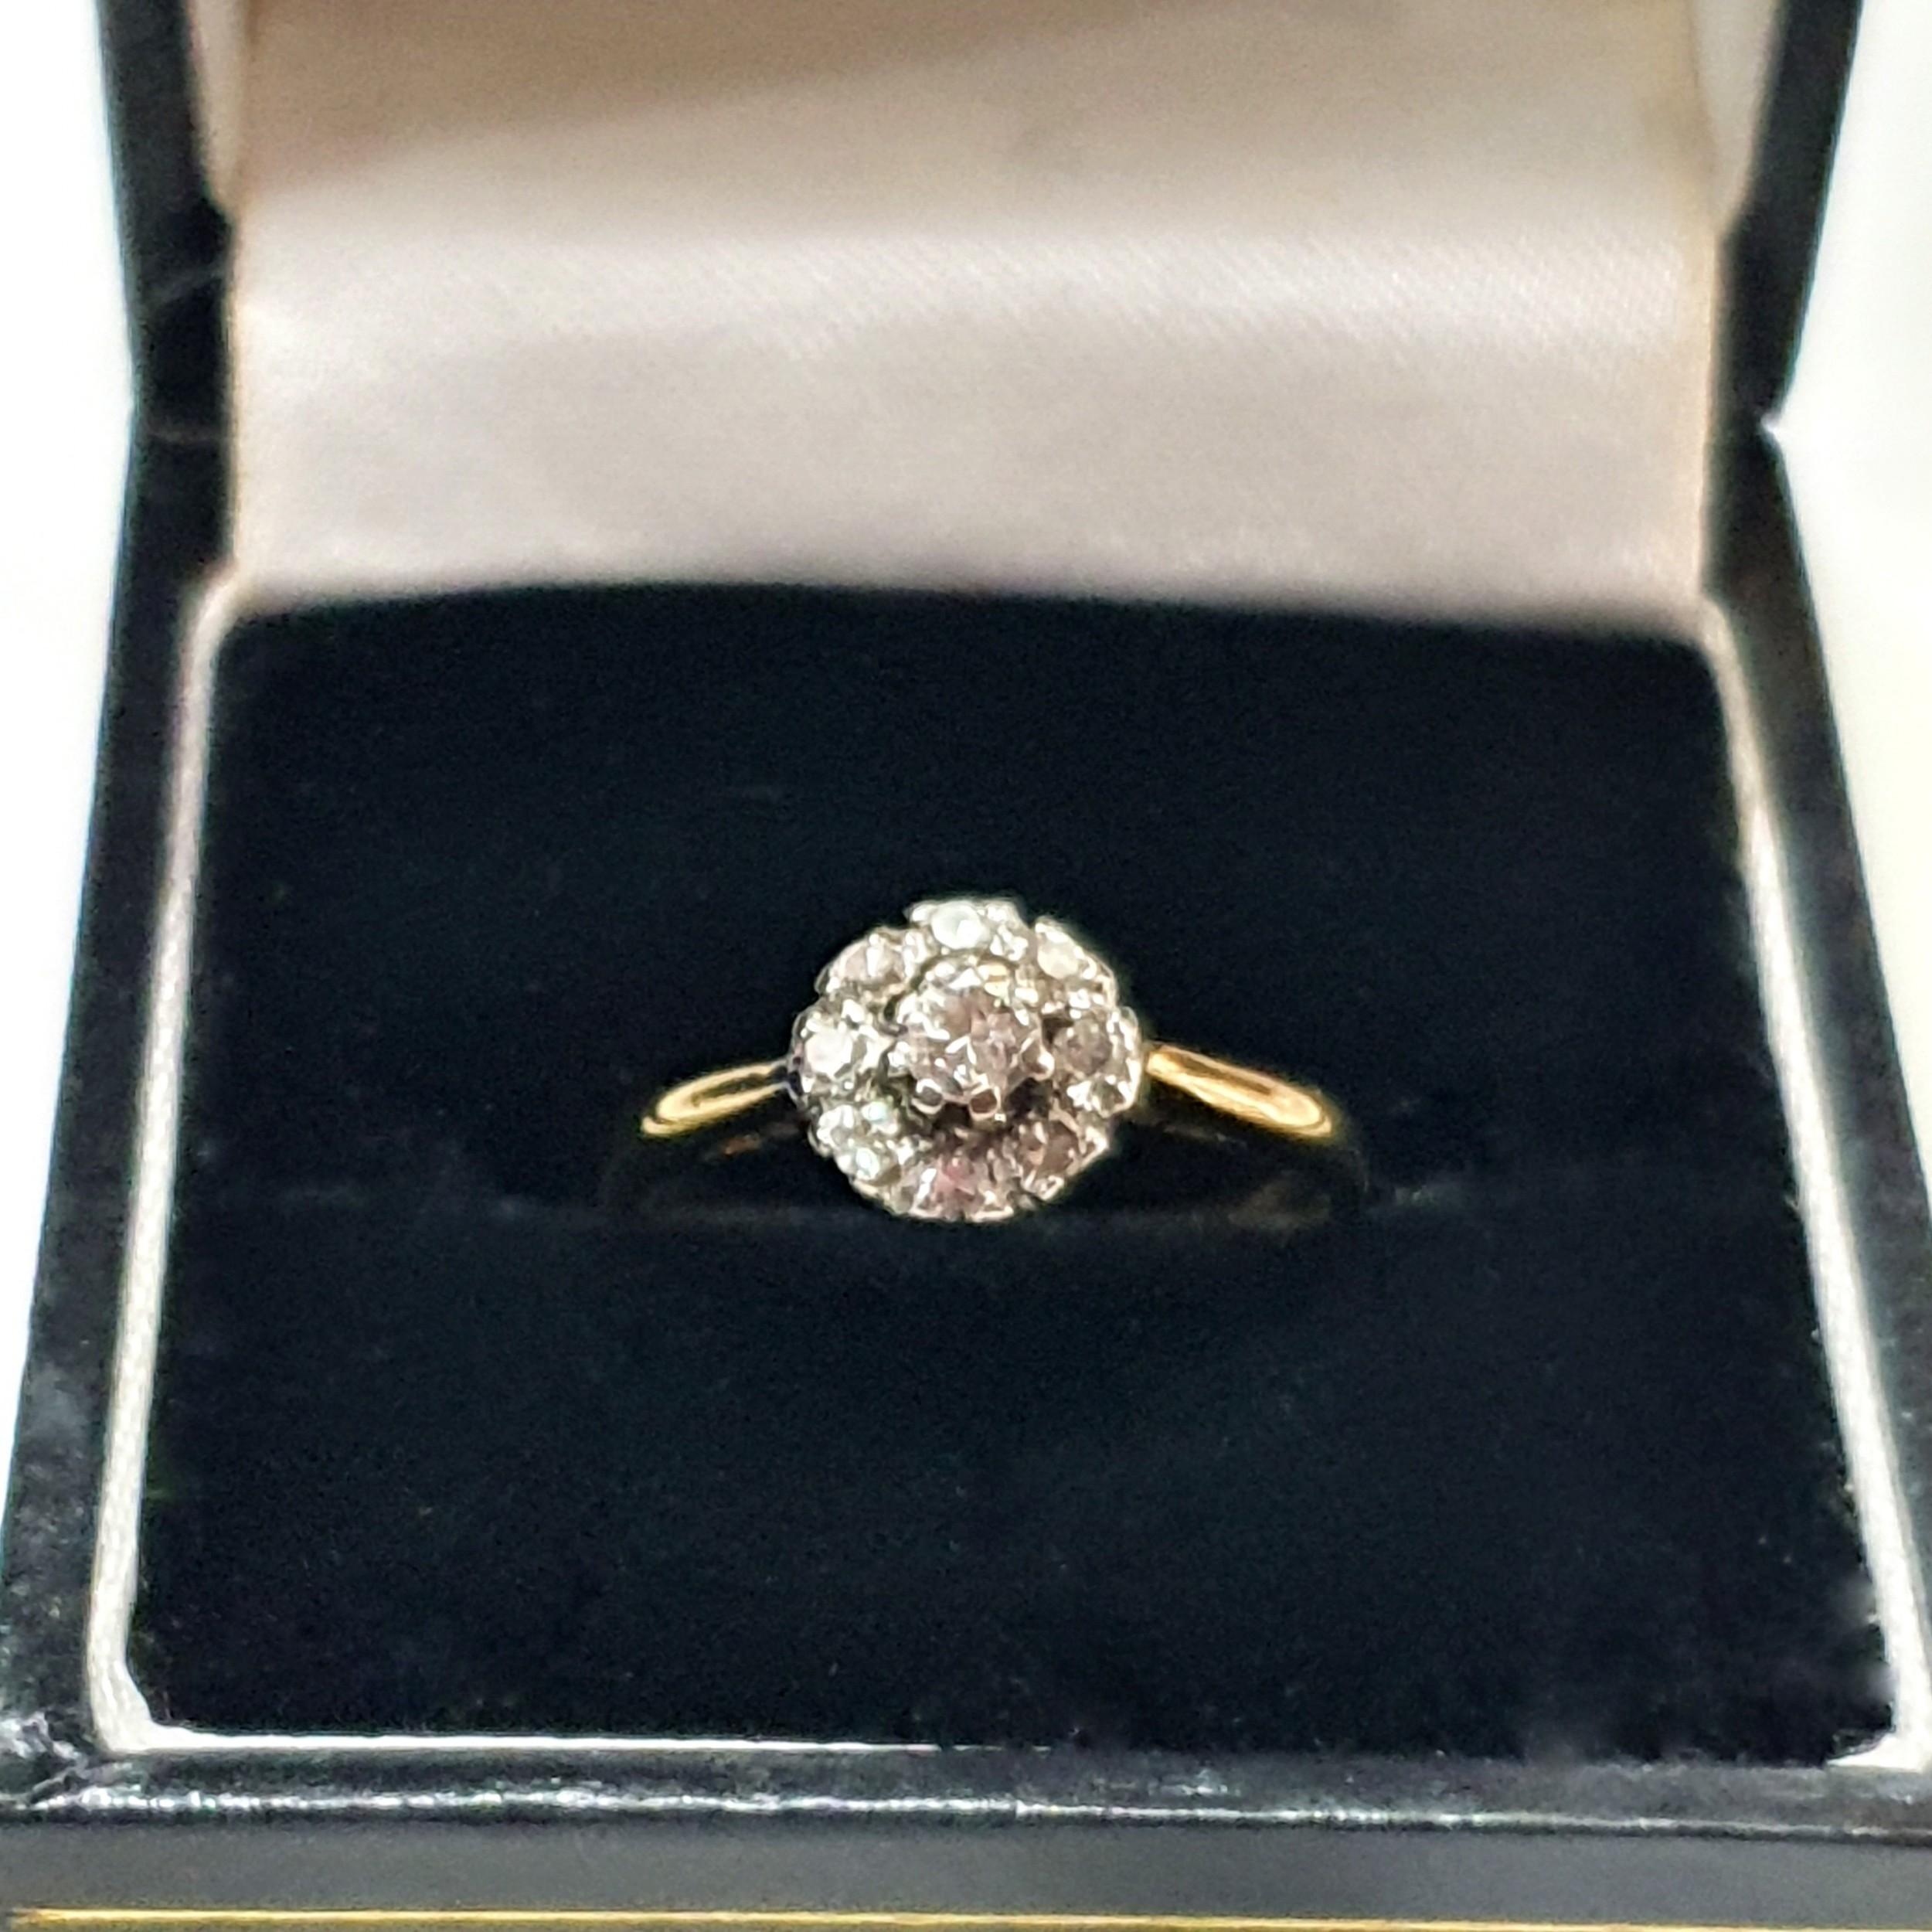 1950s old cut diamond ring 18 carat gold size l